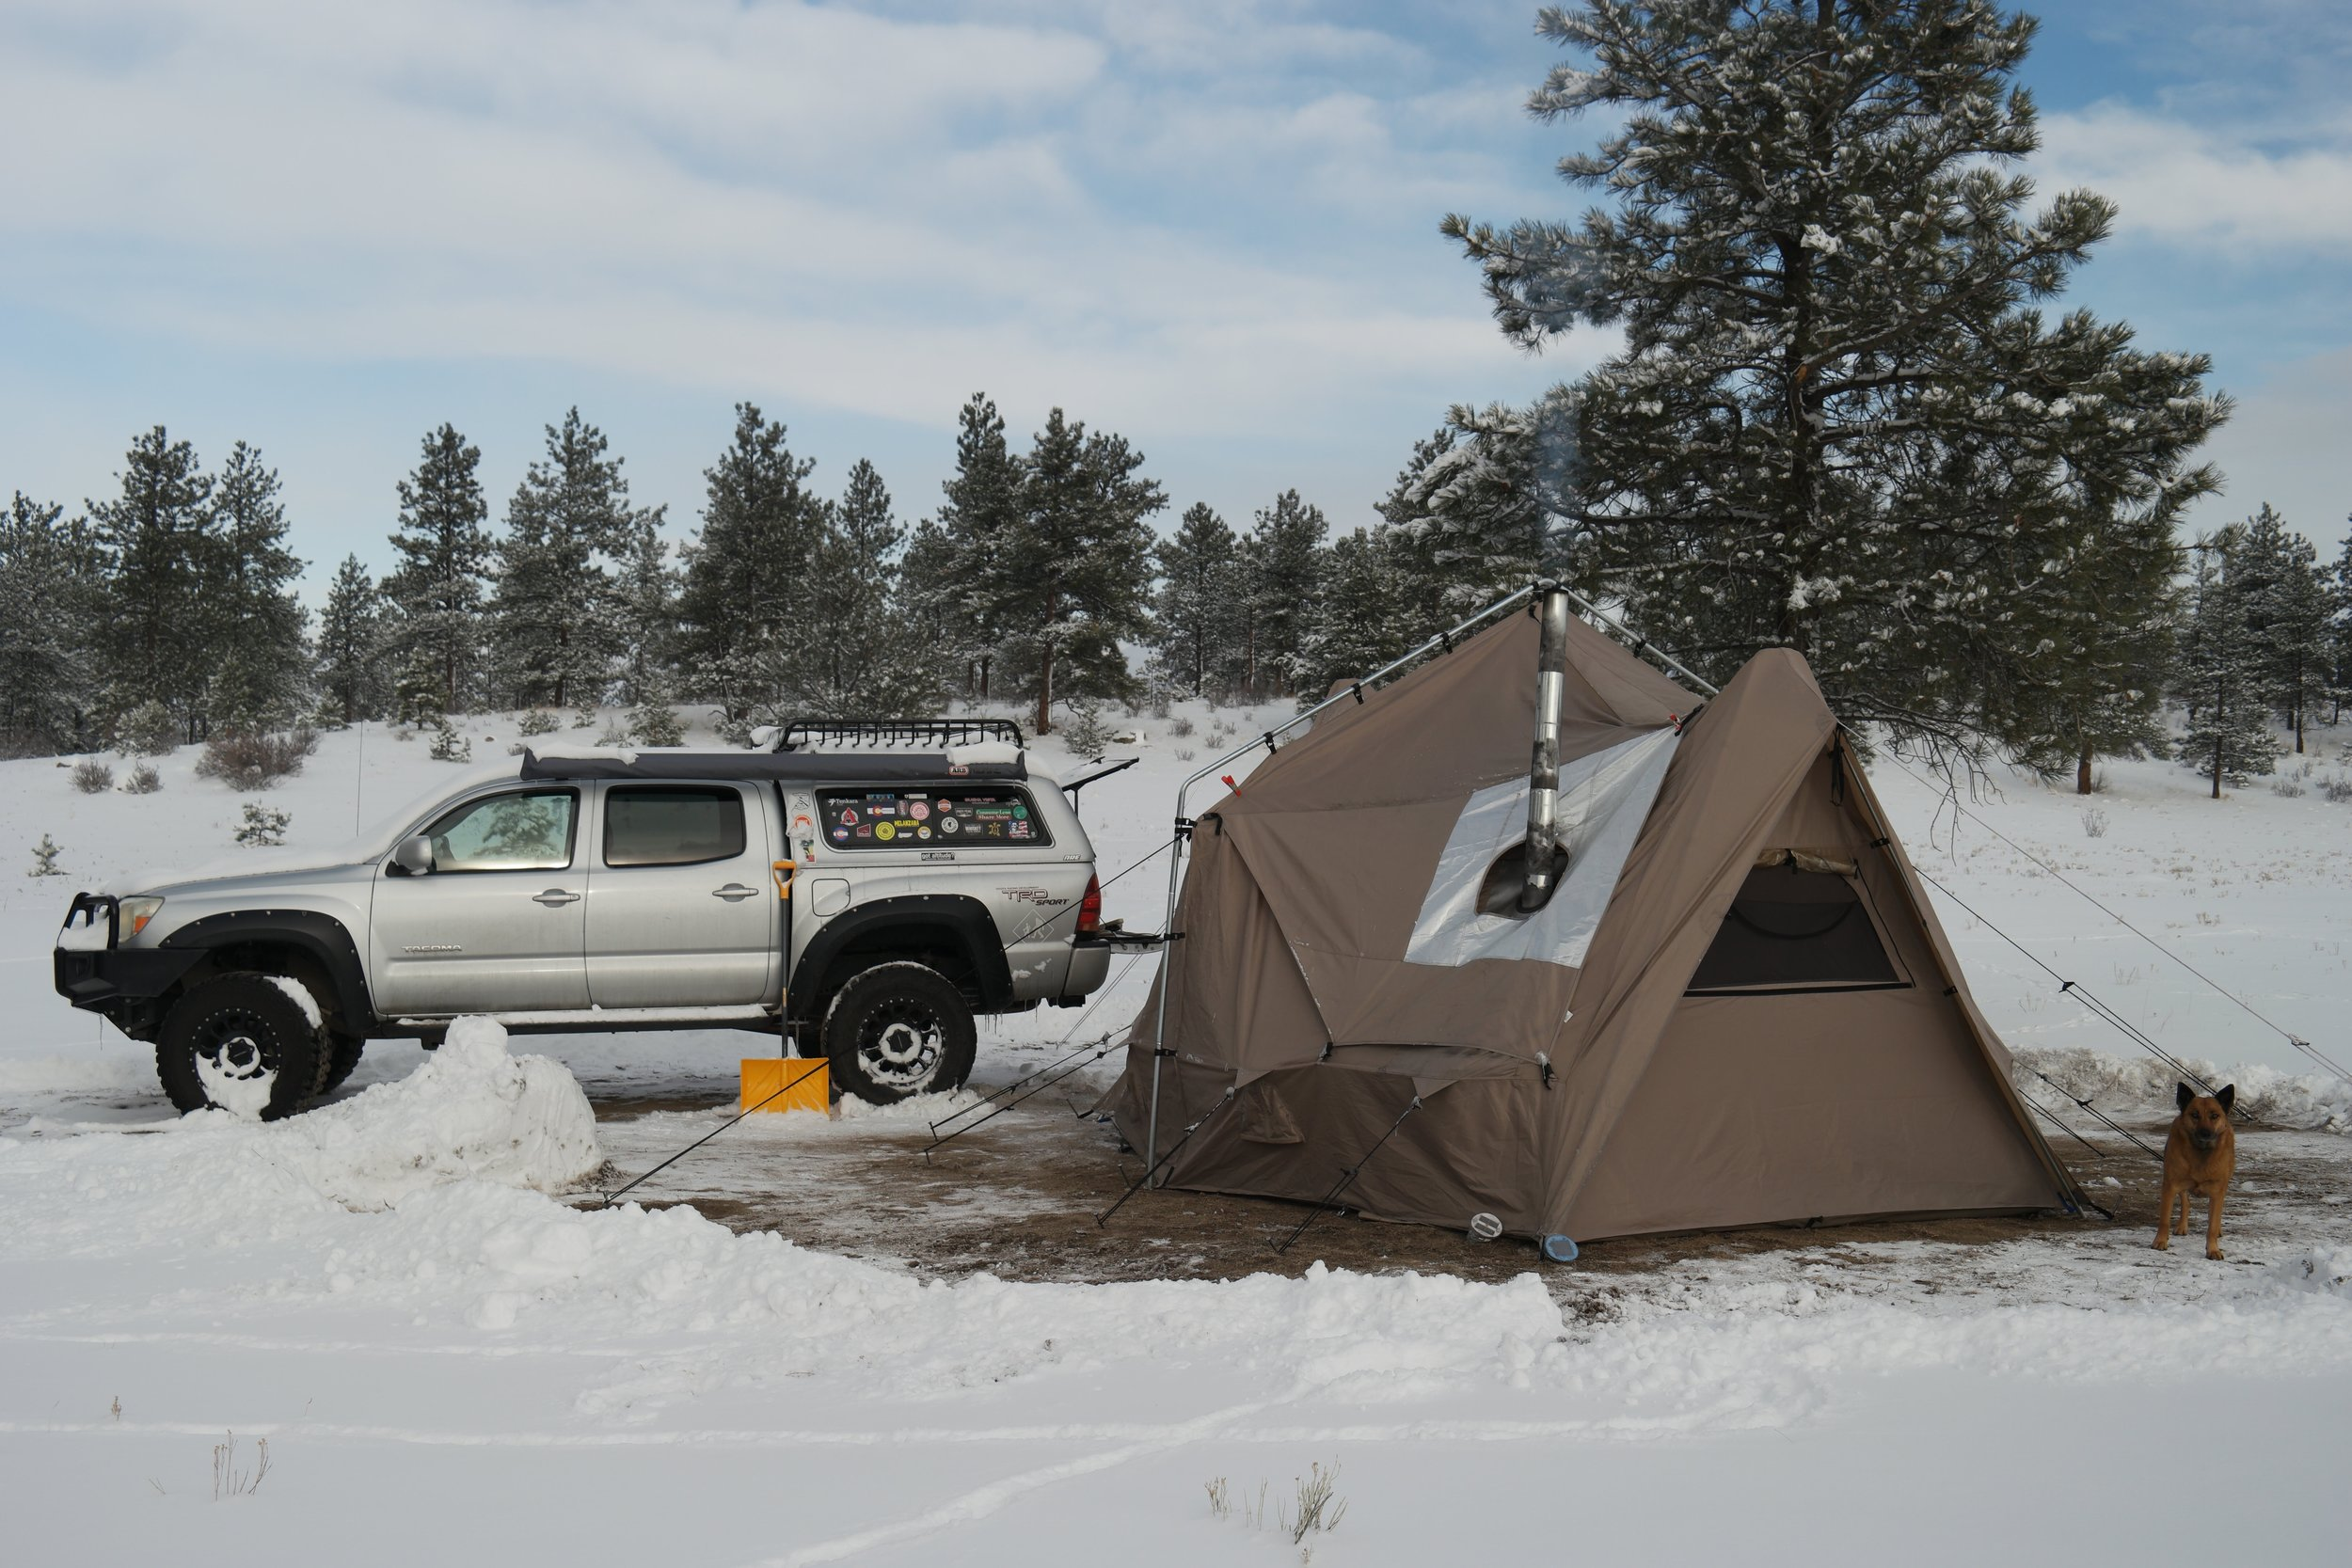 Colorado Backcountry Adventures